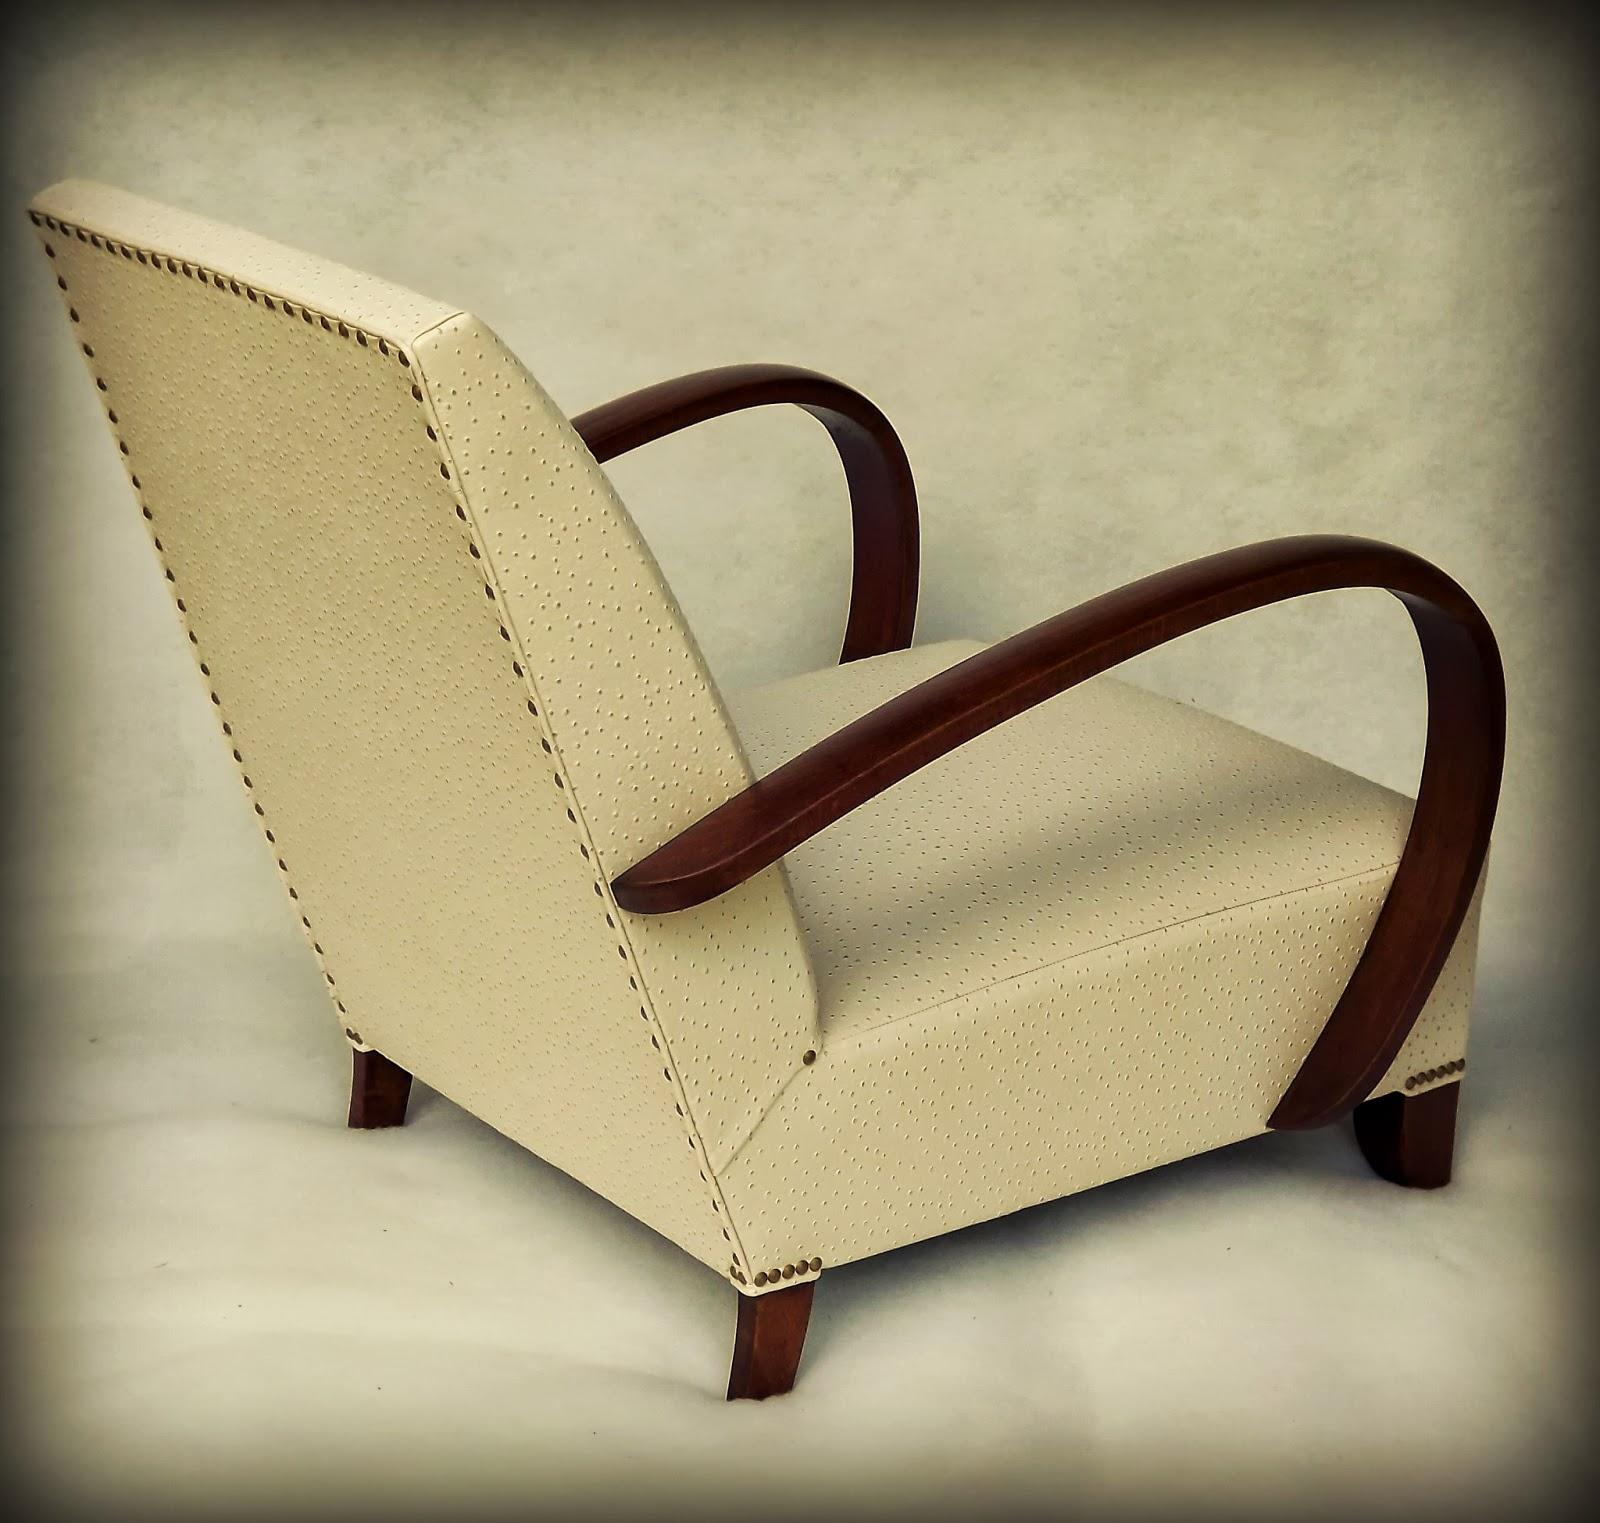 tapissier decorateur atelier romain testas r alisations. Black Bedroom Furniture Sets. Home Design Ideas